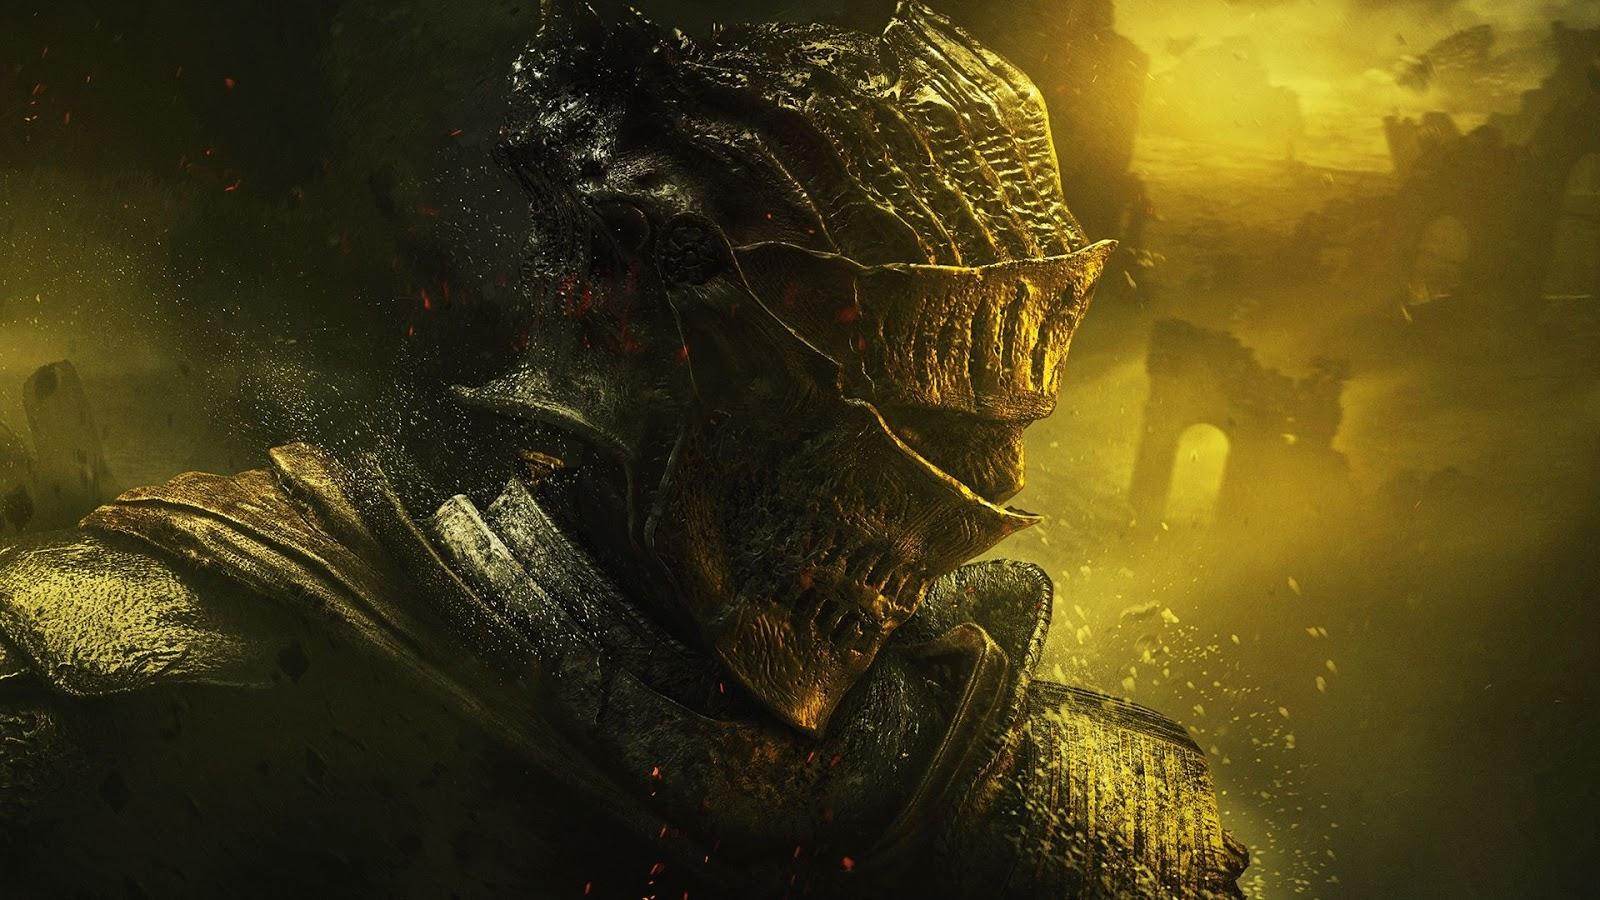 Dark Souls 1008519 Hd Wallpaper Backgrounds Download